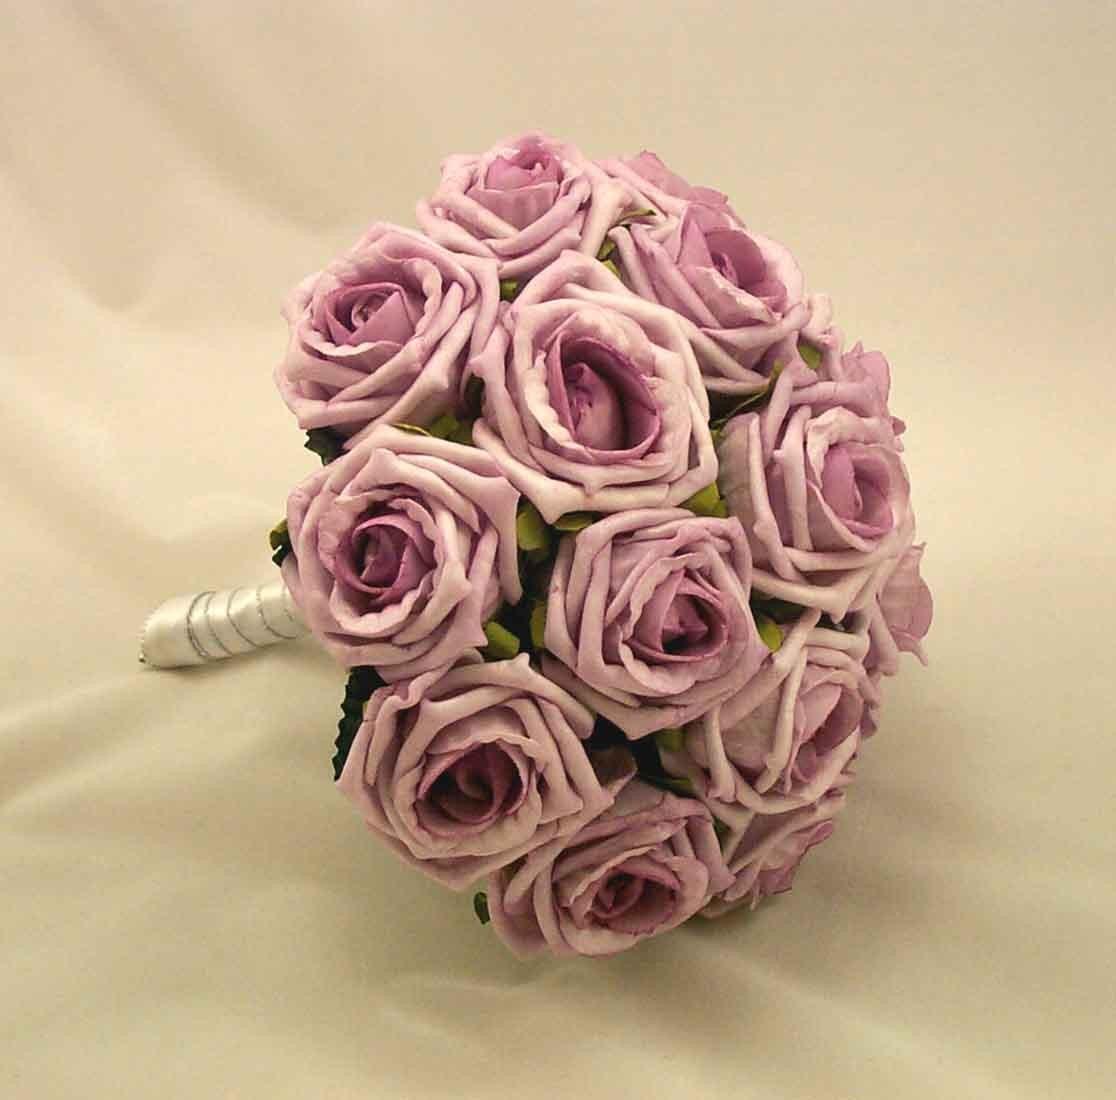 Lavender / Llilac Rose Bridesmaid's Posy